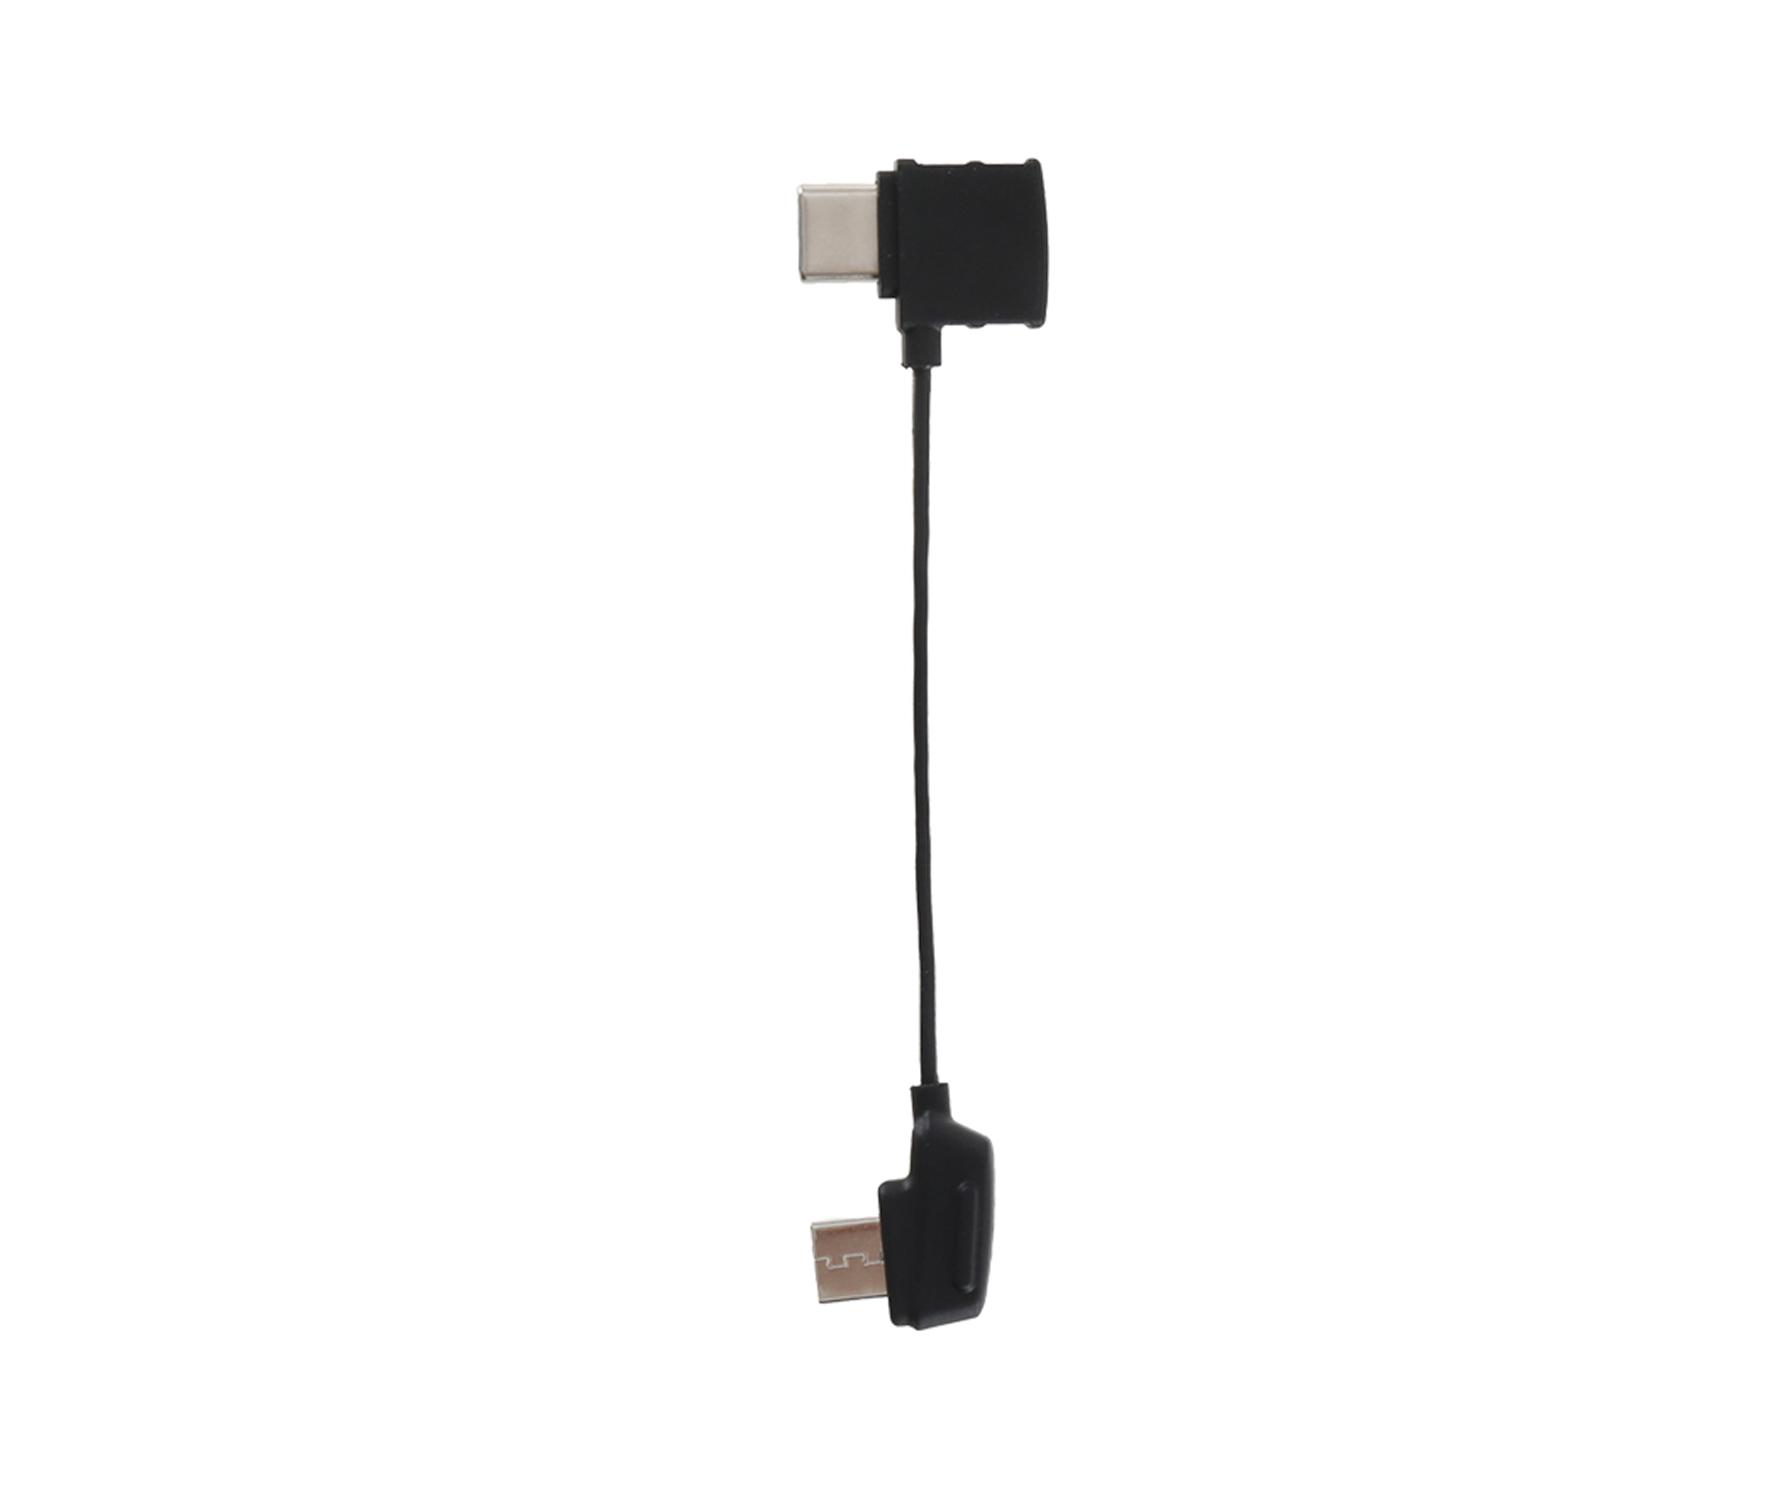 Mavic Rc Cable Type C Connector Innovative Uas Drones